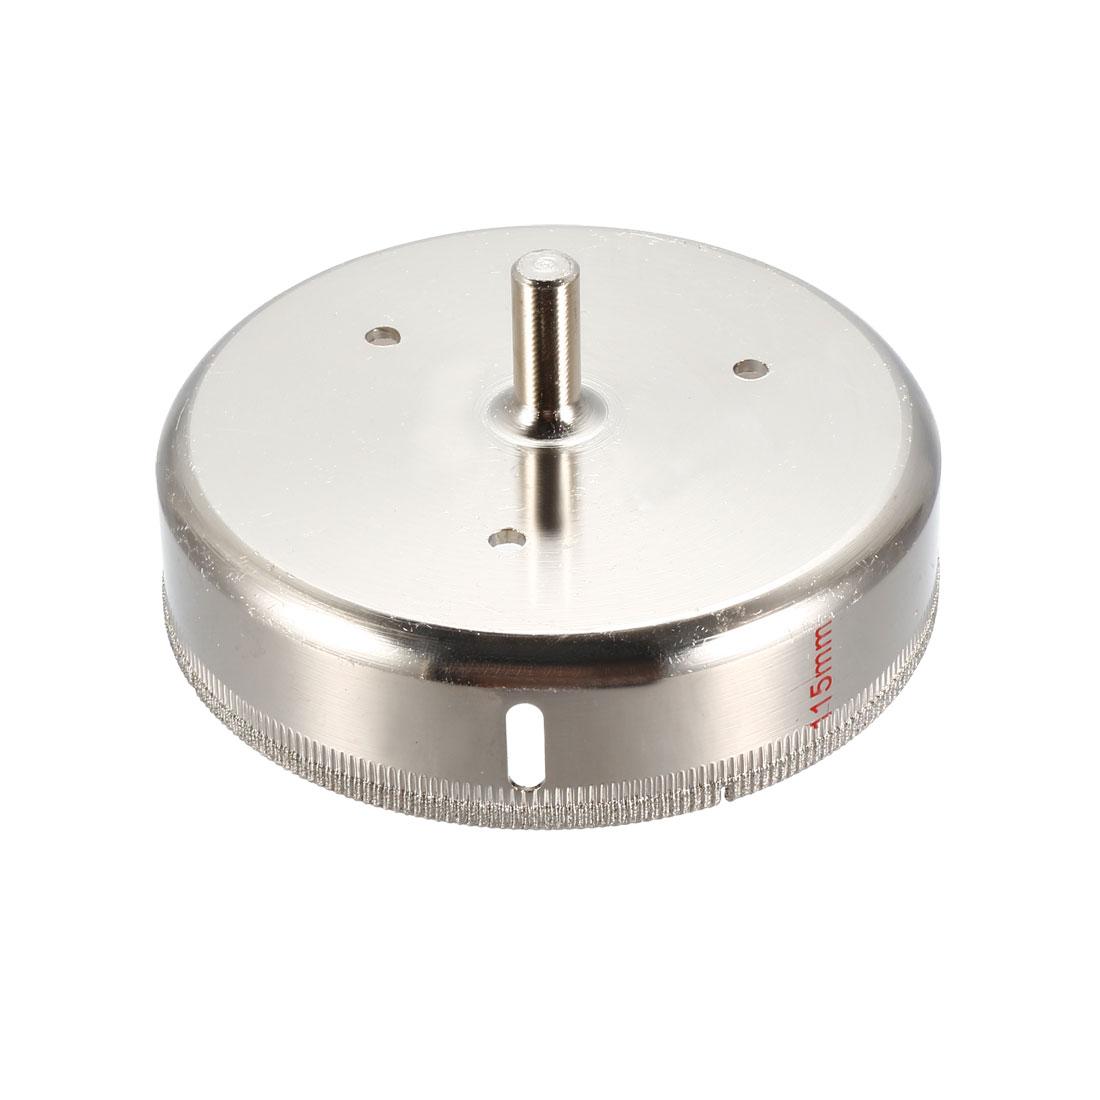 6-20mm Diamond Coated Drill Bit Hole Saw Kit Glass Cutter Tip Tools Accessories